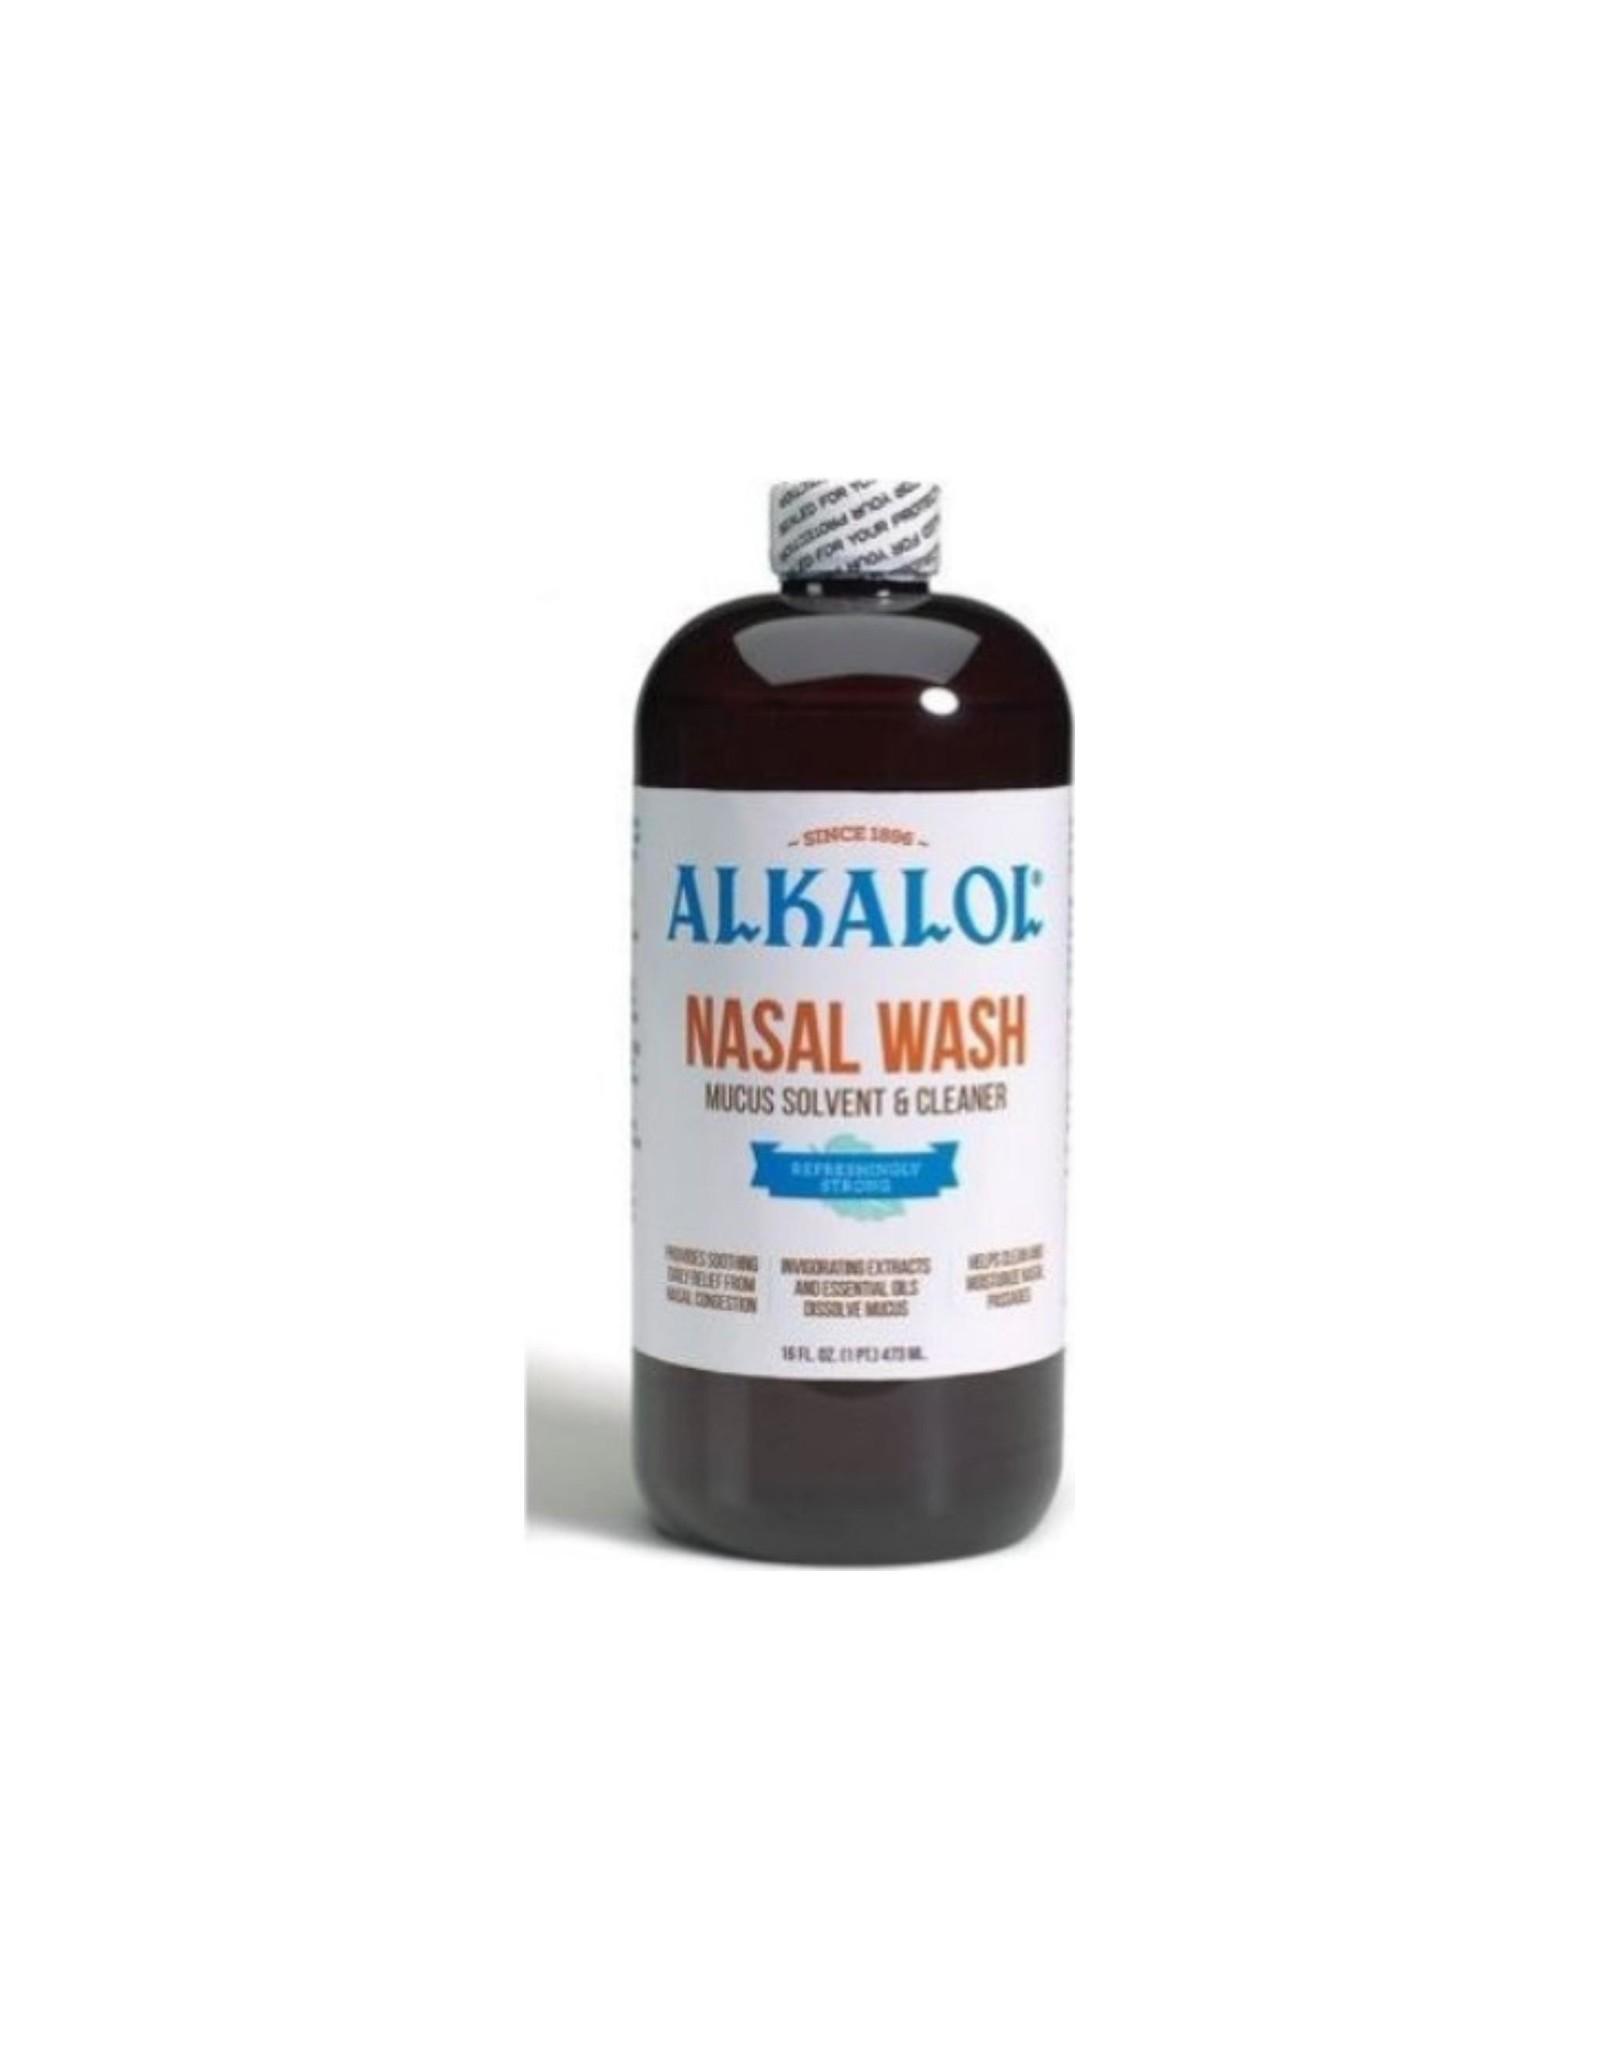 Alkalol Nasal Rinse